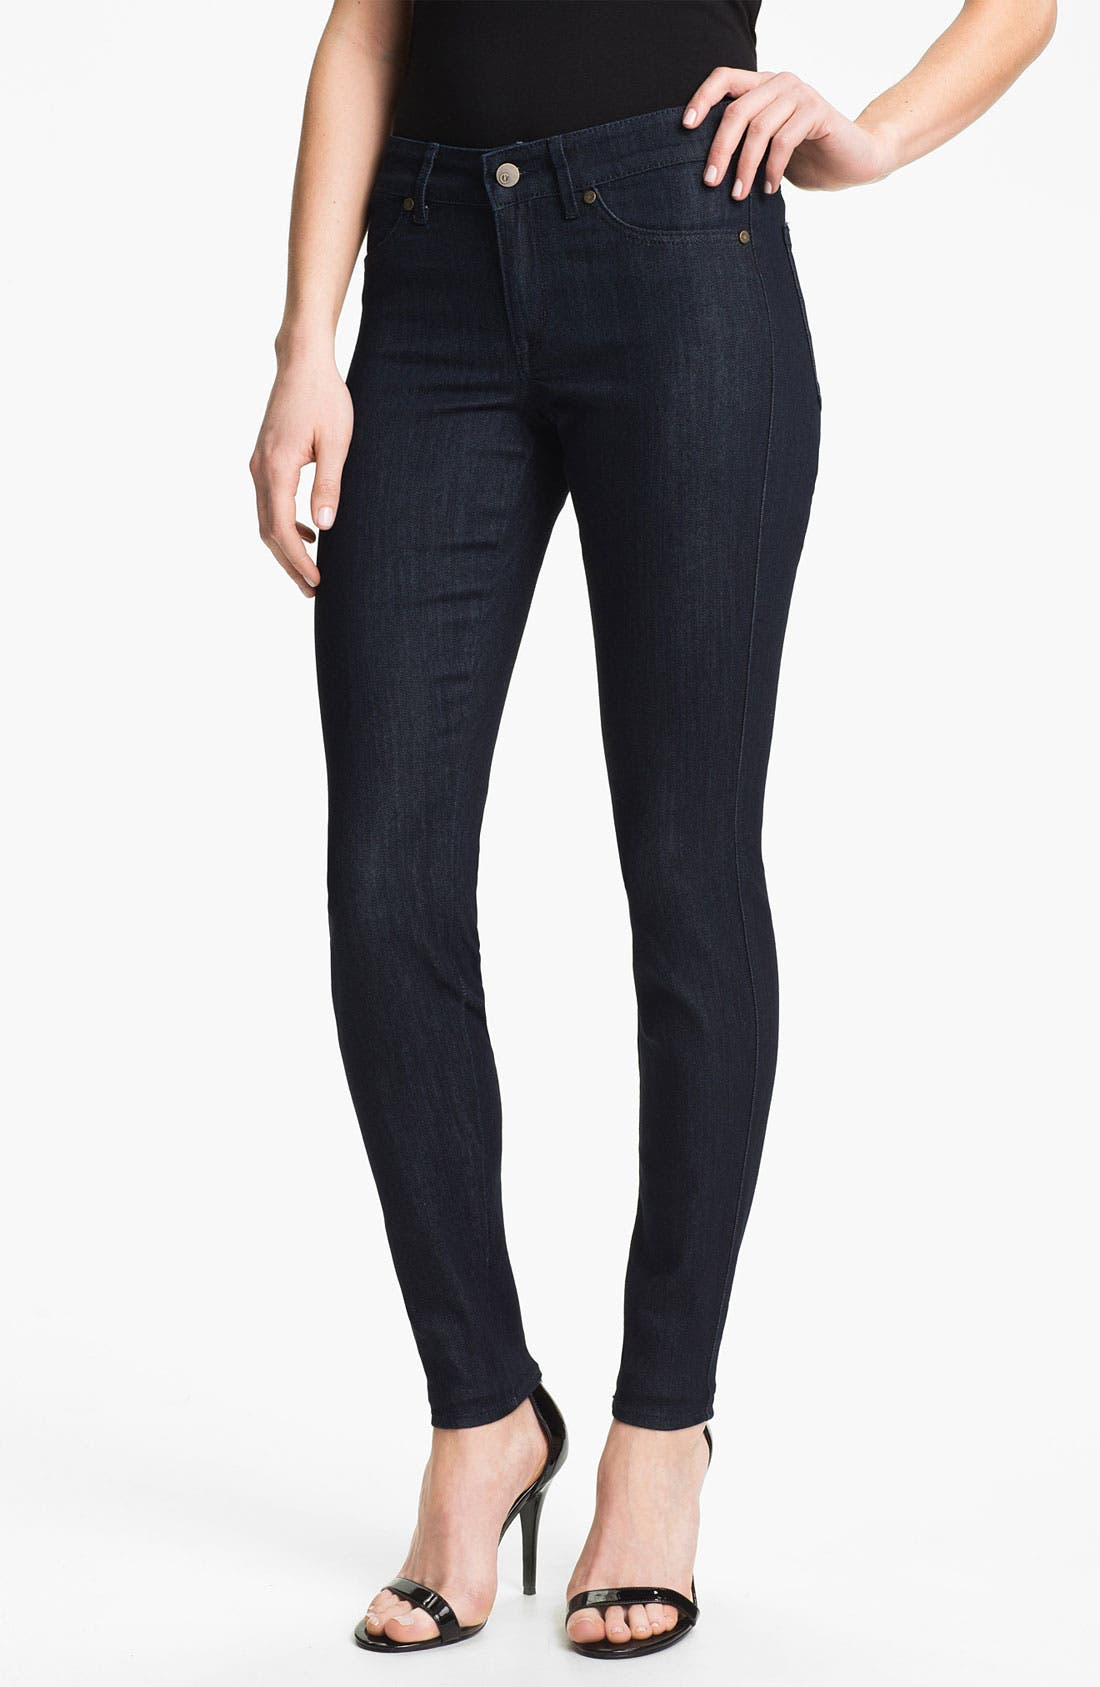 Alternate Image 1 Selected - CJ by Cookie Johnson 'Joy' Stretch Skinny Jeans